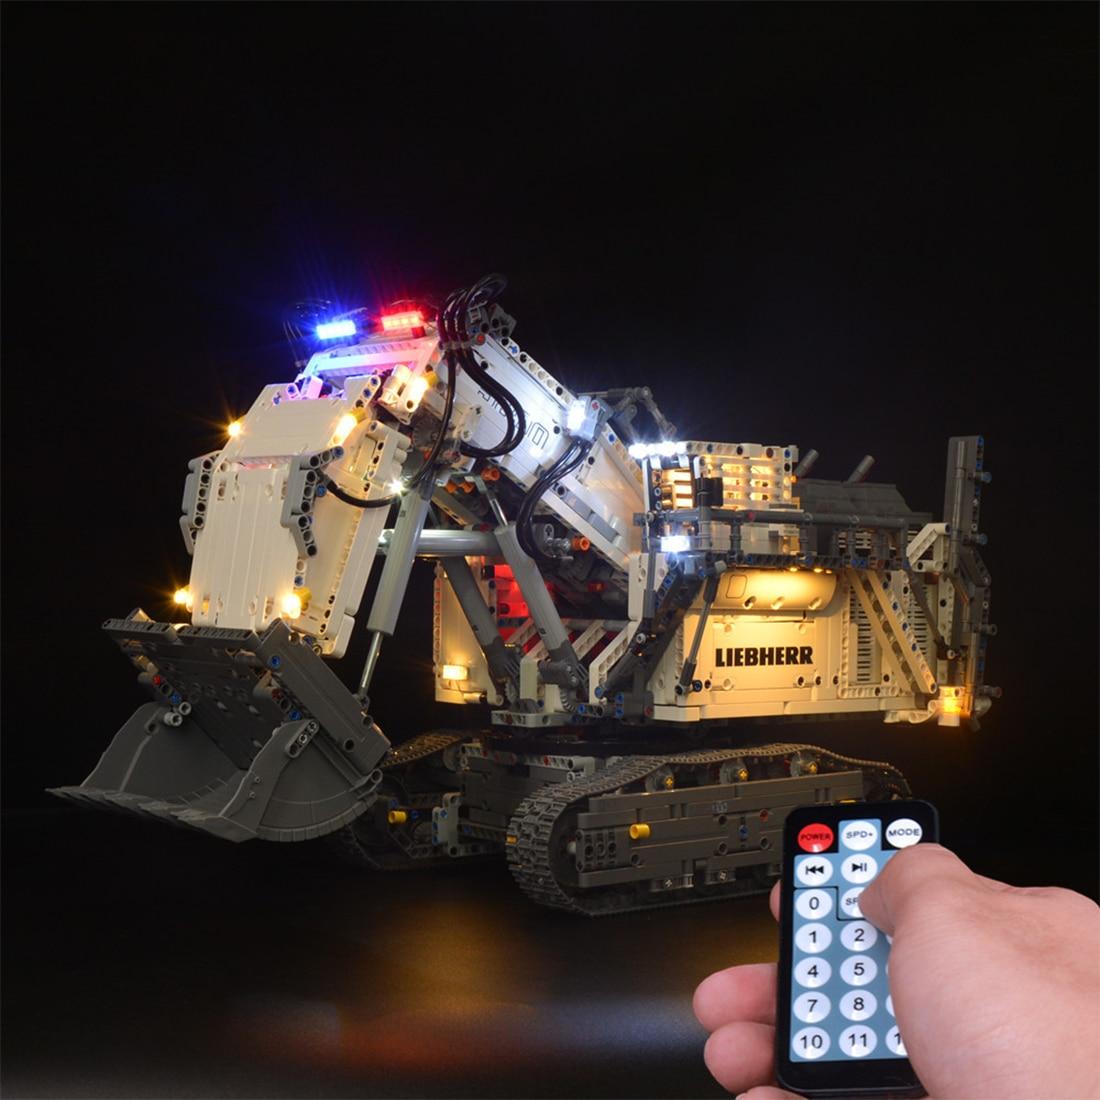 Building Block LED Lighting Kit For Liebherr R 9800 Excavator 42100(LED Light Included Only, No Kit)- Remote Control Version